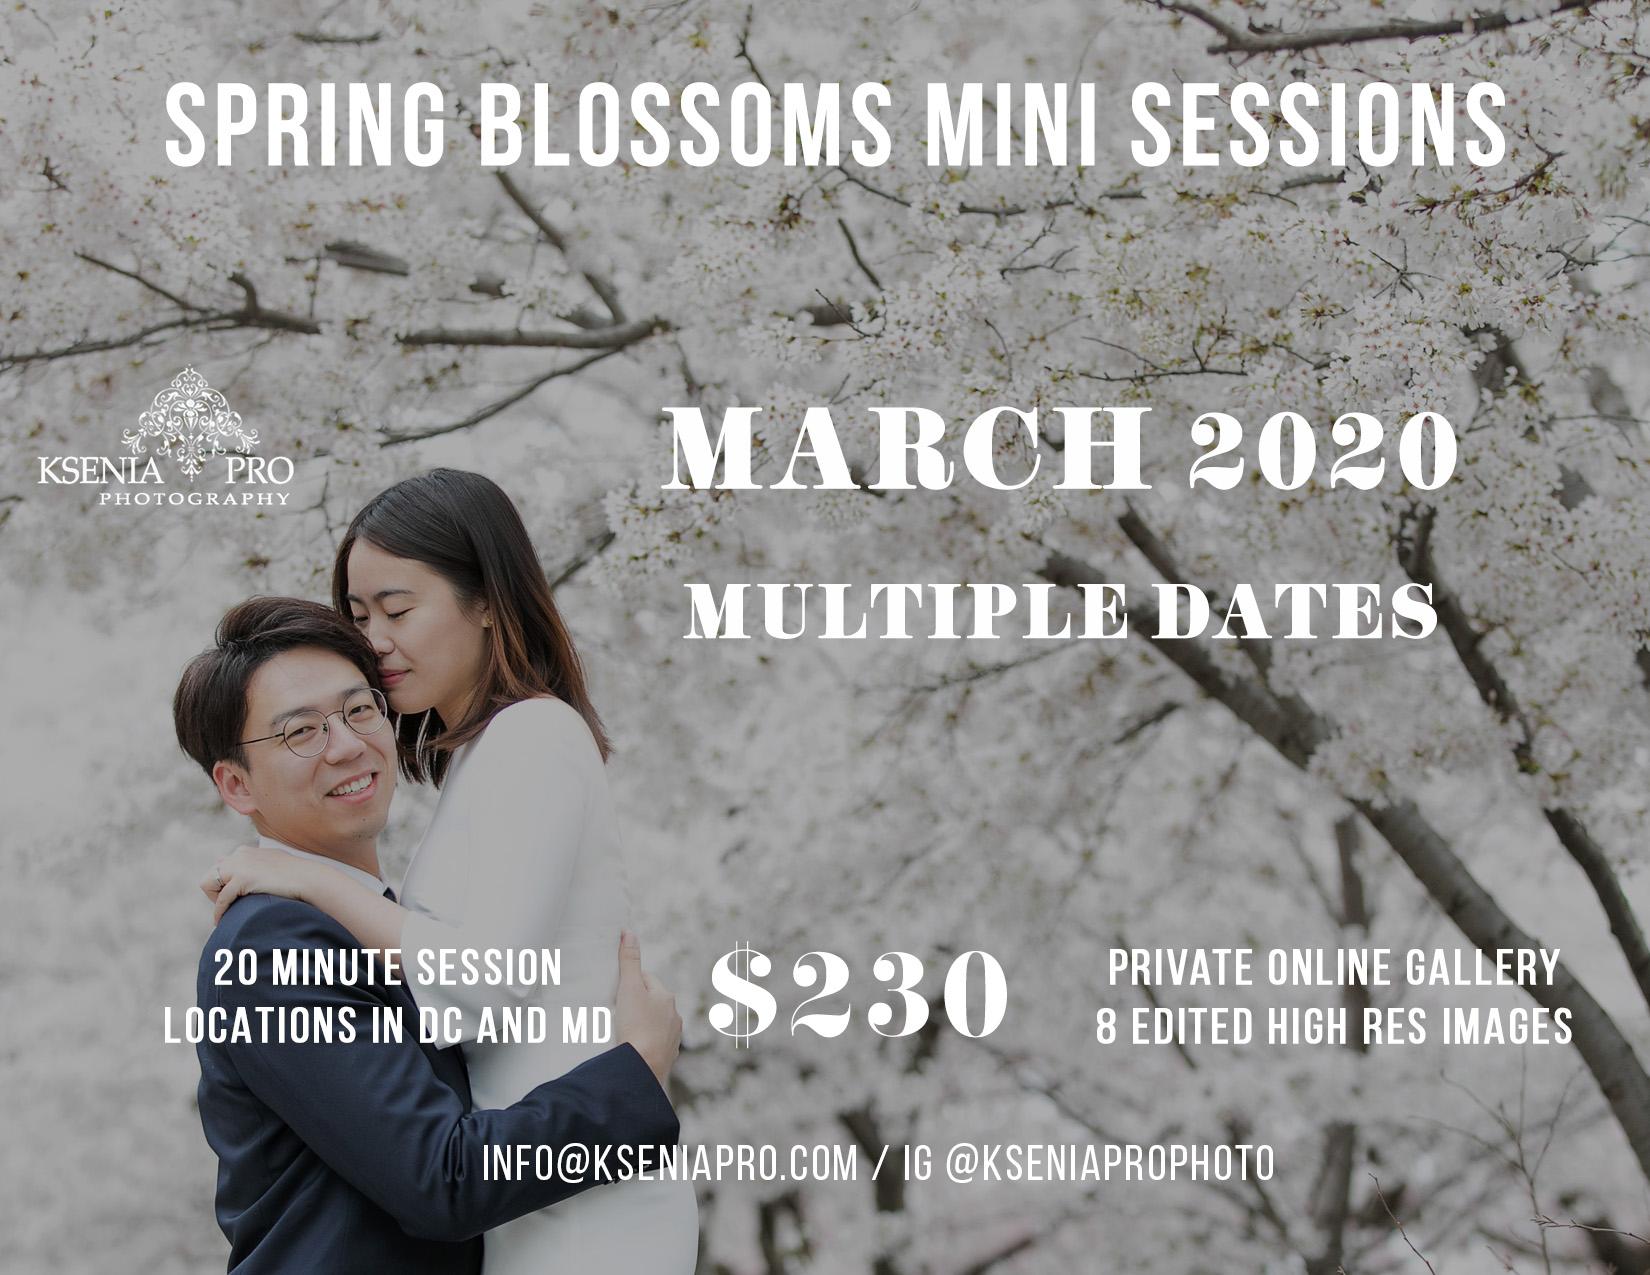 spring-mini-sessions-2020-cherry-blossoms-washington-dc-md-ksenia-pro-photography